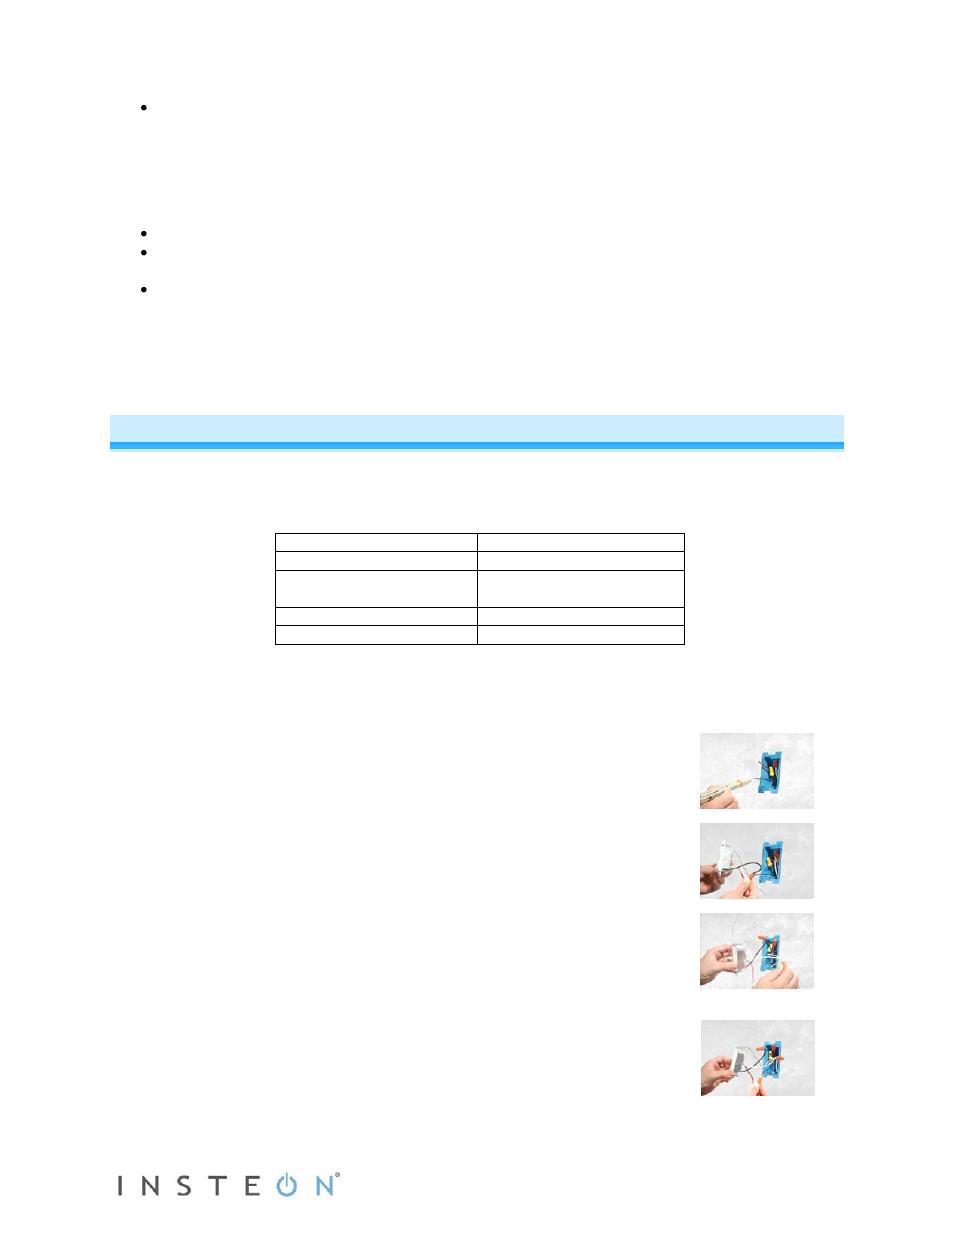 medium resolution of installing multi way togglelinc modules insteon togglelinc relay 2466sw manual user manual page 7 18